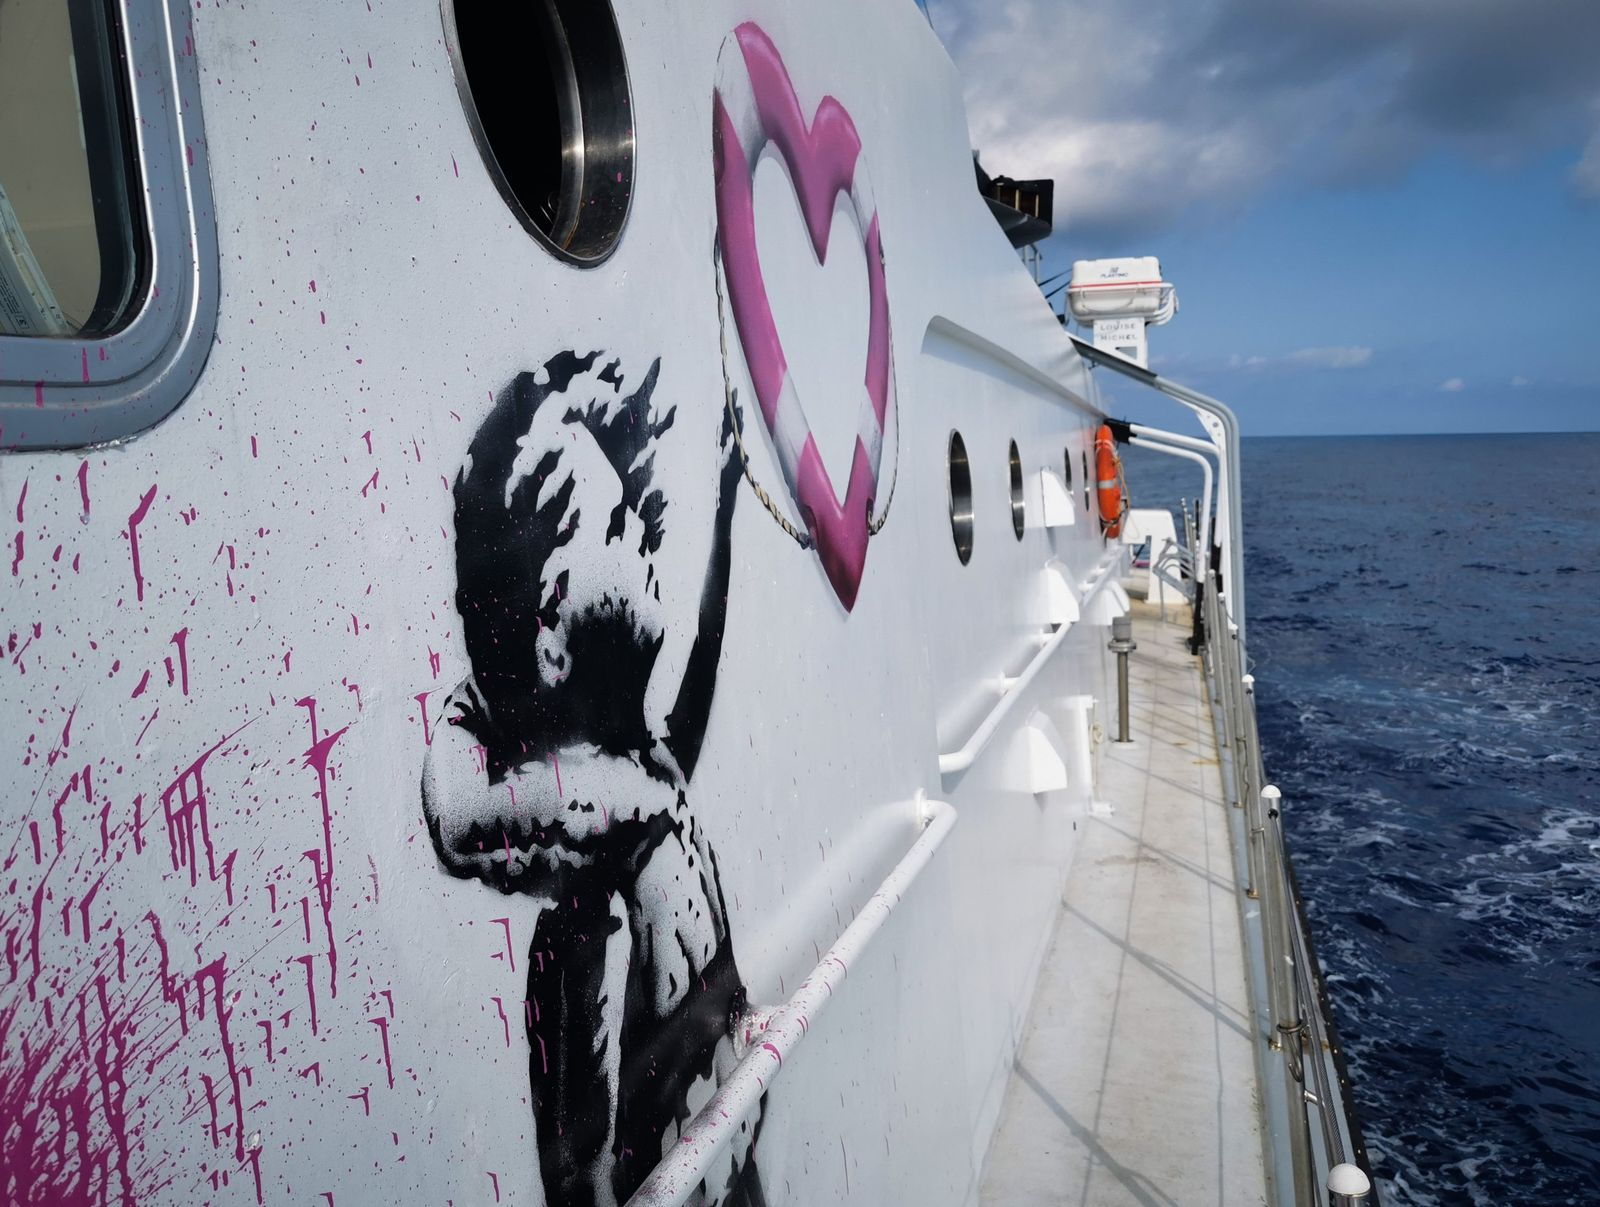 Banksy bemalt Rettungsschiff MV Louise Michel